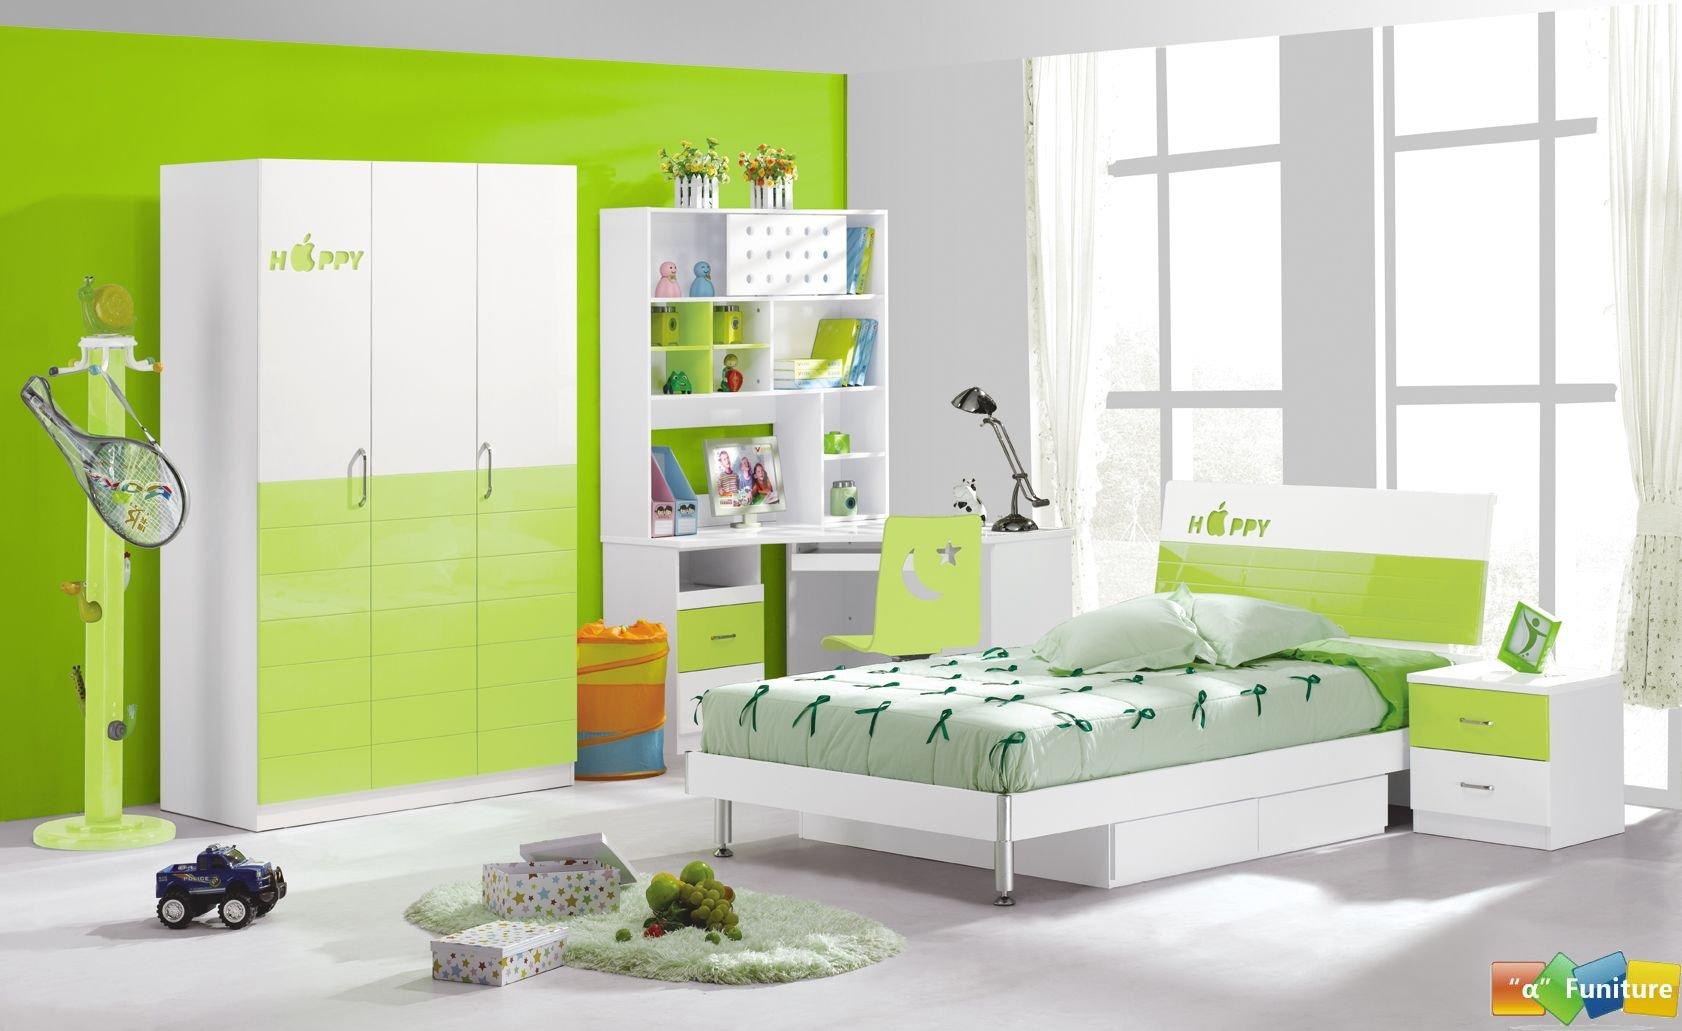 4 Pcs New Full Size Bedroom Set Mdf Panels Children